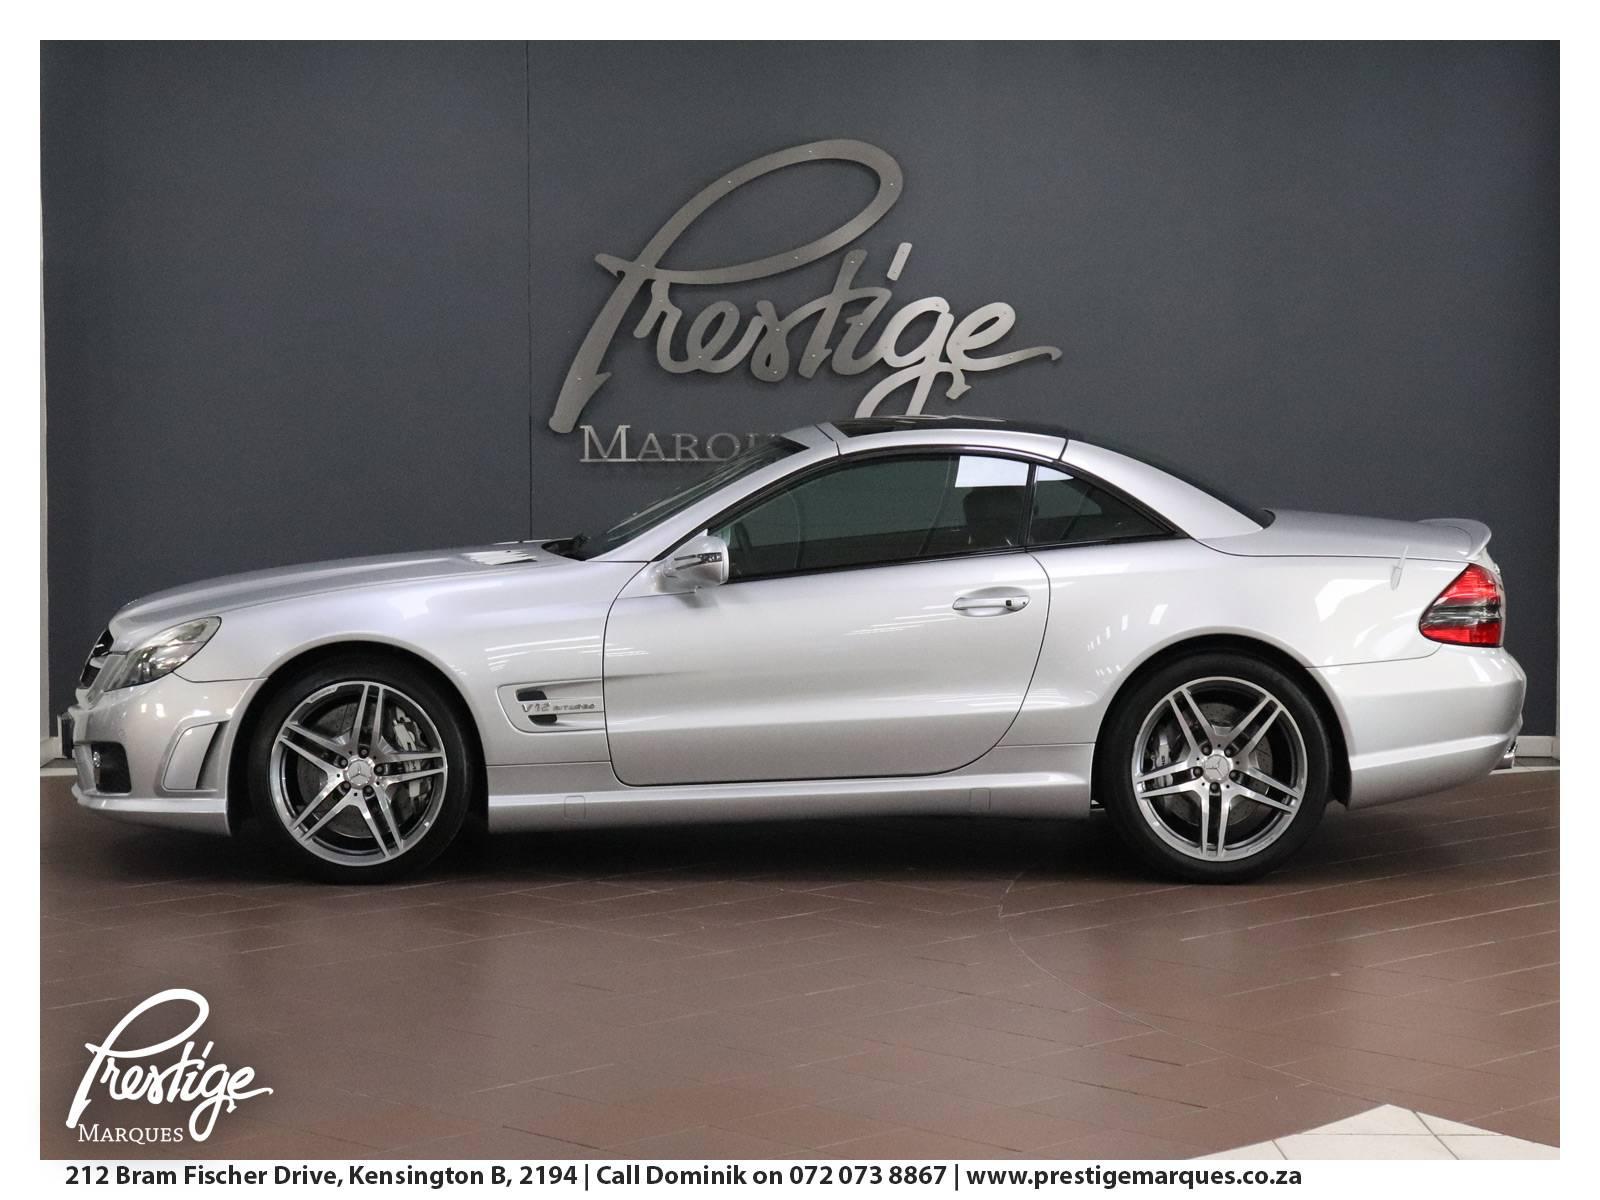 2008-Mercedes Benz-SL Cab-Silver-Prestige-Marques-Randburg-Sandton-12